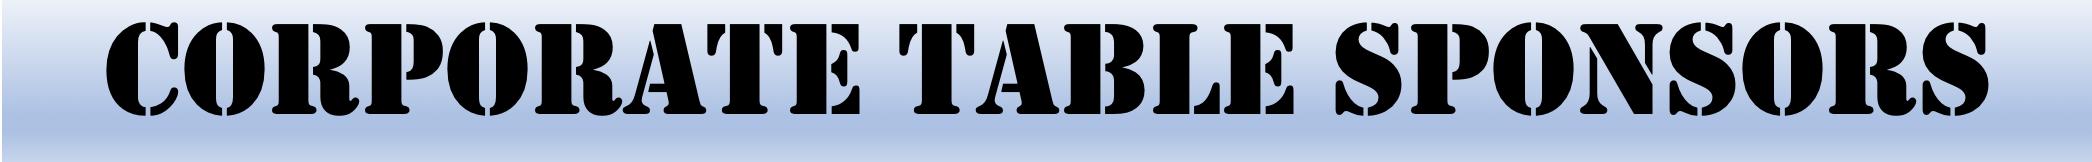 Corporate Table Sponsors Header